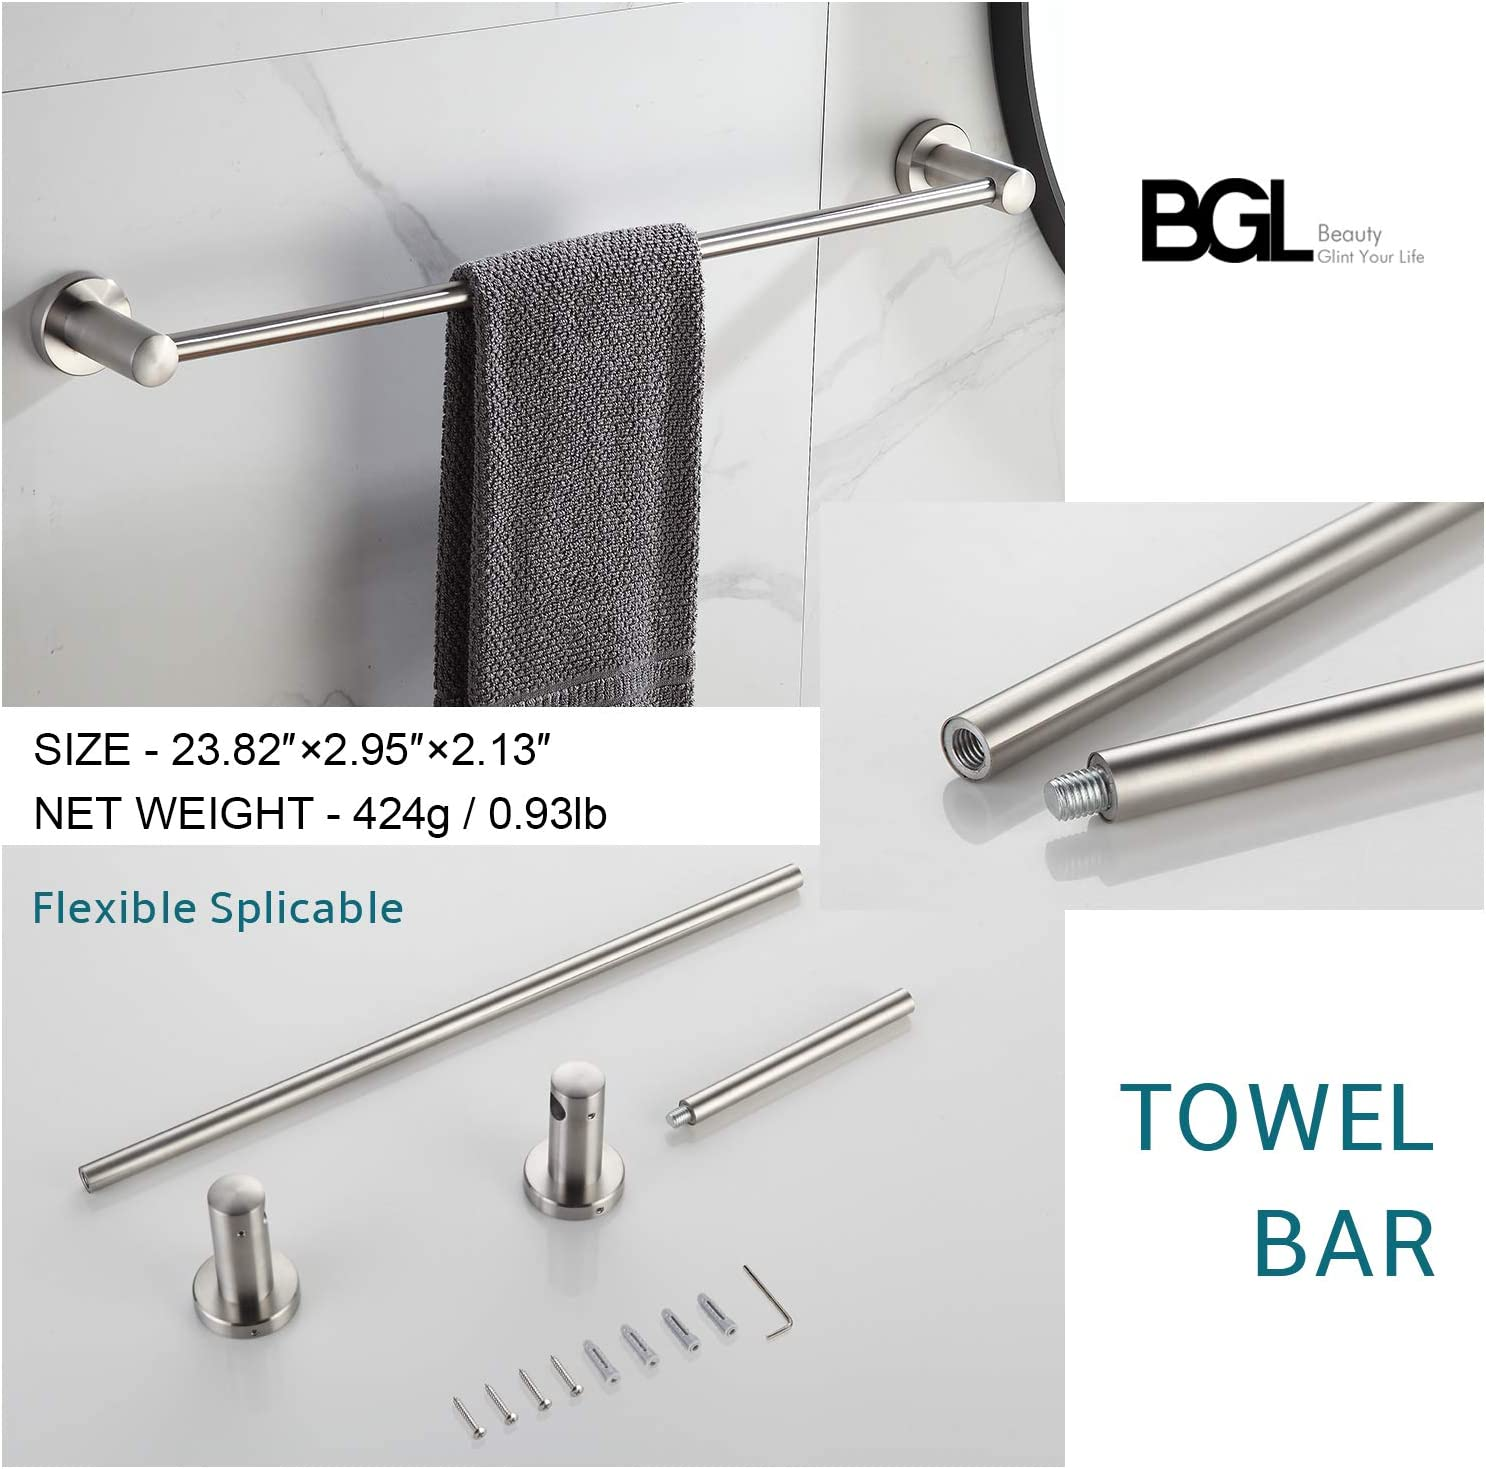 BGL Bathroom Accessory Set Adjustable Expandable Towel Bar 304 Stainless Steel 4-Piece Brushed Nickel Bathroom Hardware Set Robe Hook Toilet Paper Holder Towel Ring Towel Bar